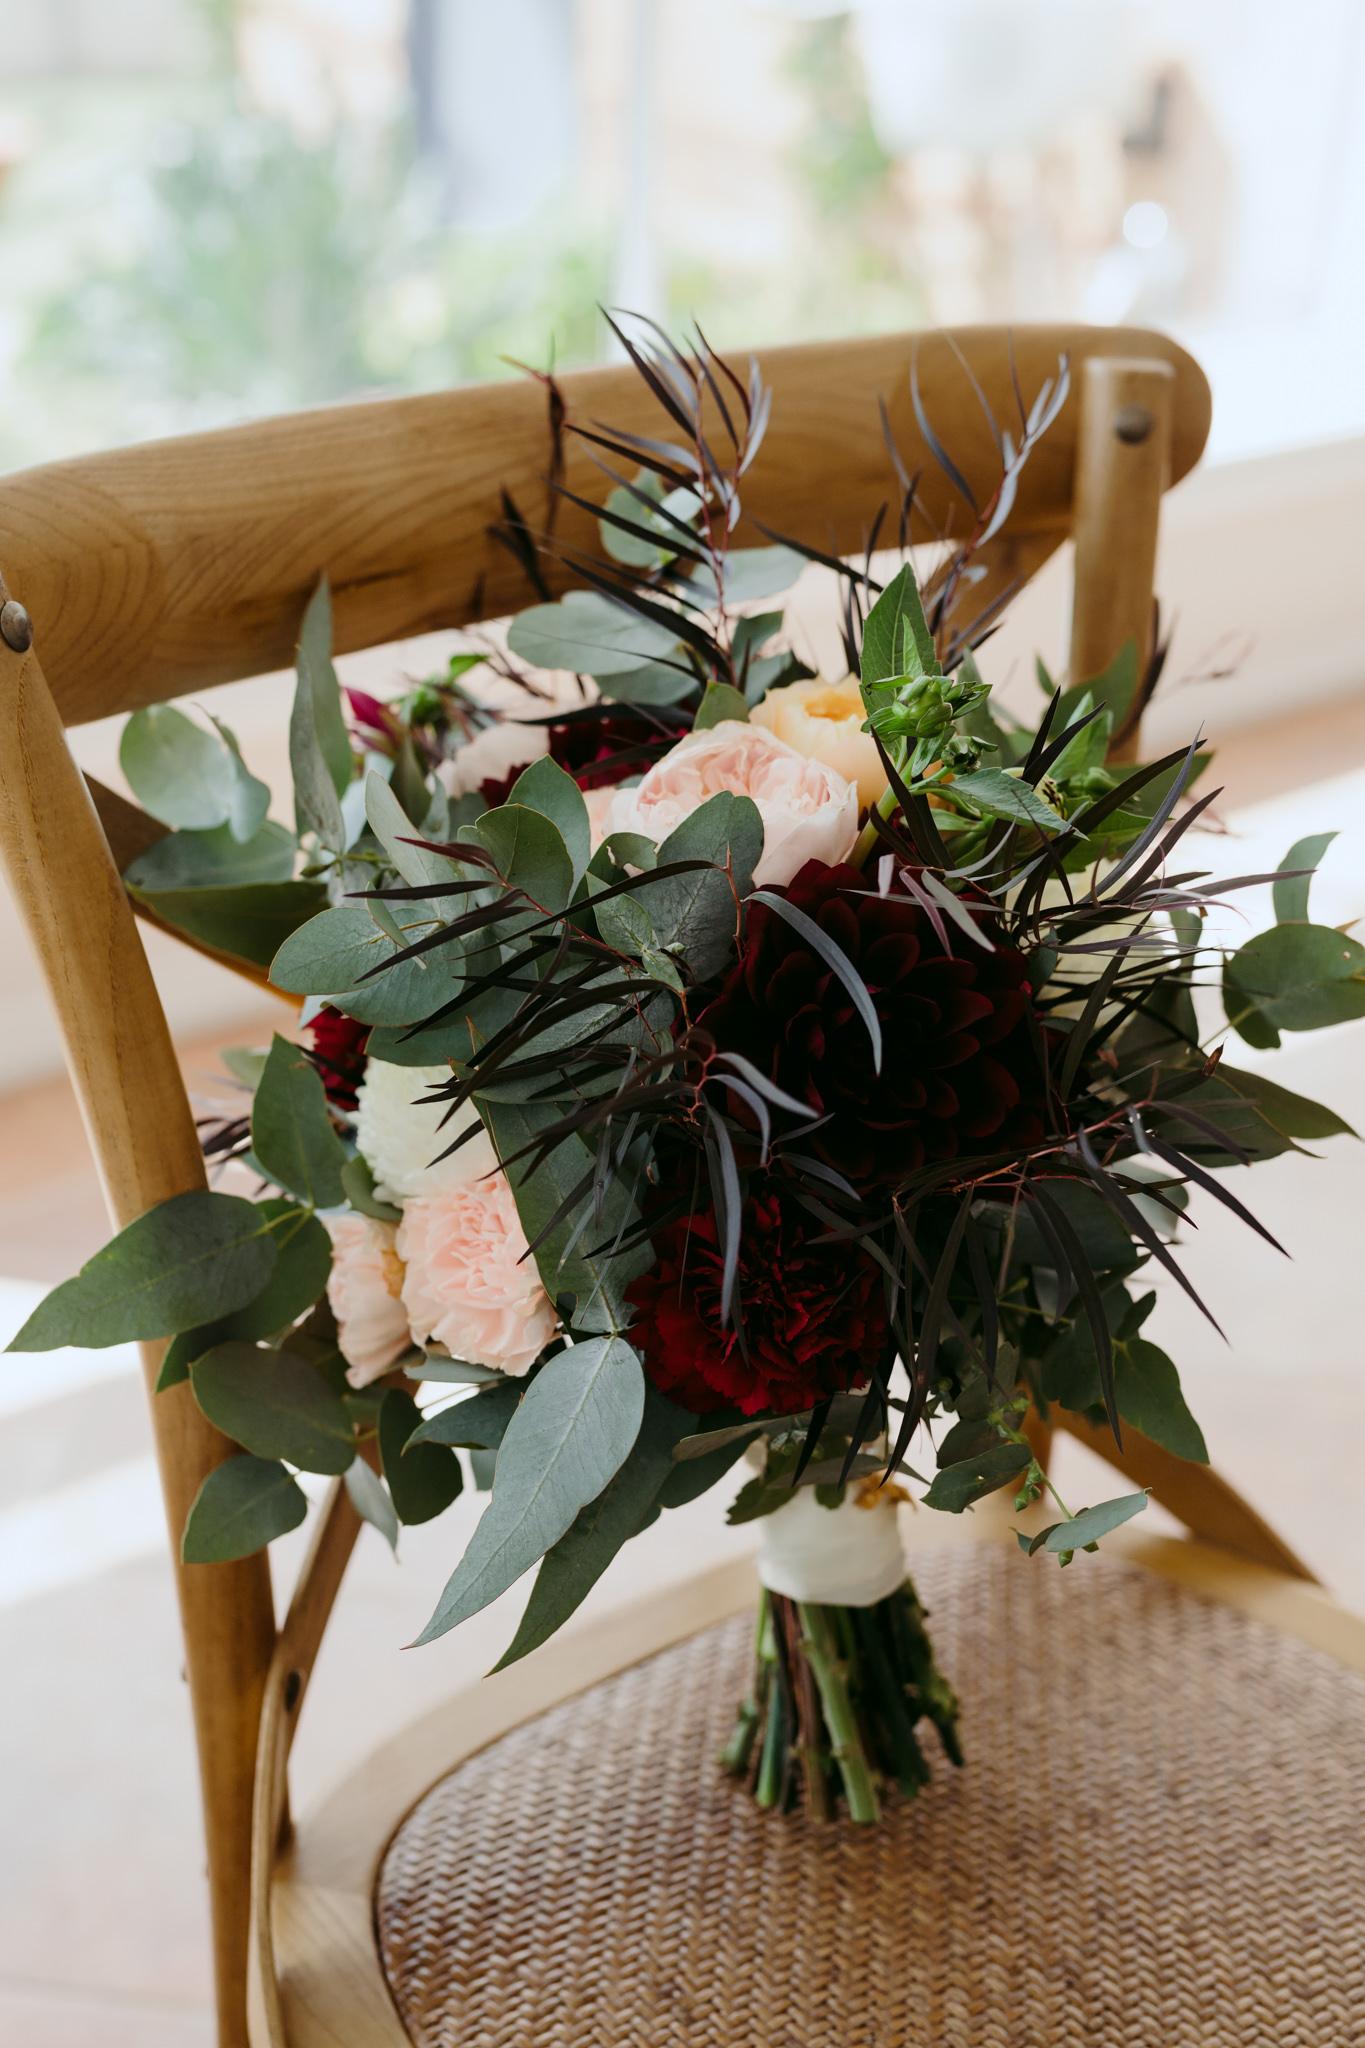 Erin Latimore Mudgee Canberra Wedding Photographer ROSEBANK GUESTHOUSE OLD THEATRE TONIC MILLTHORPE_024.JPG